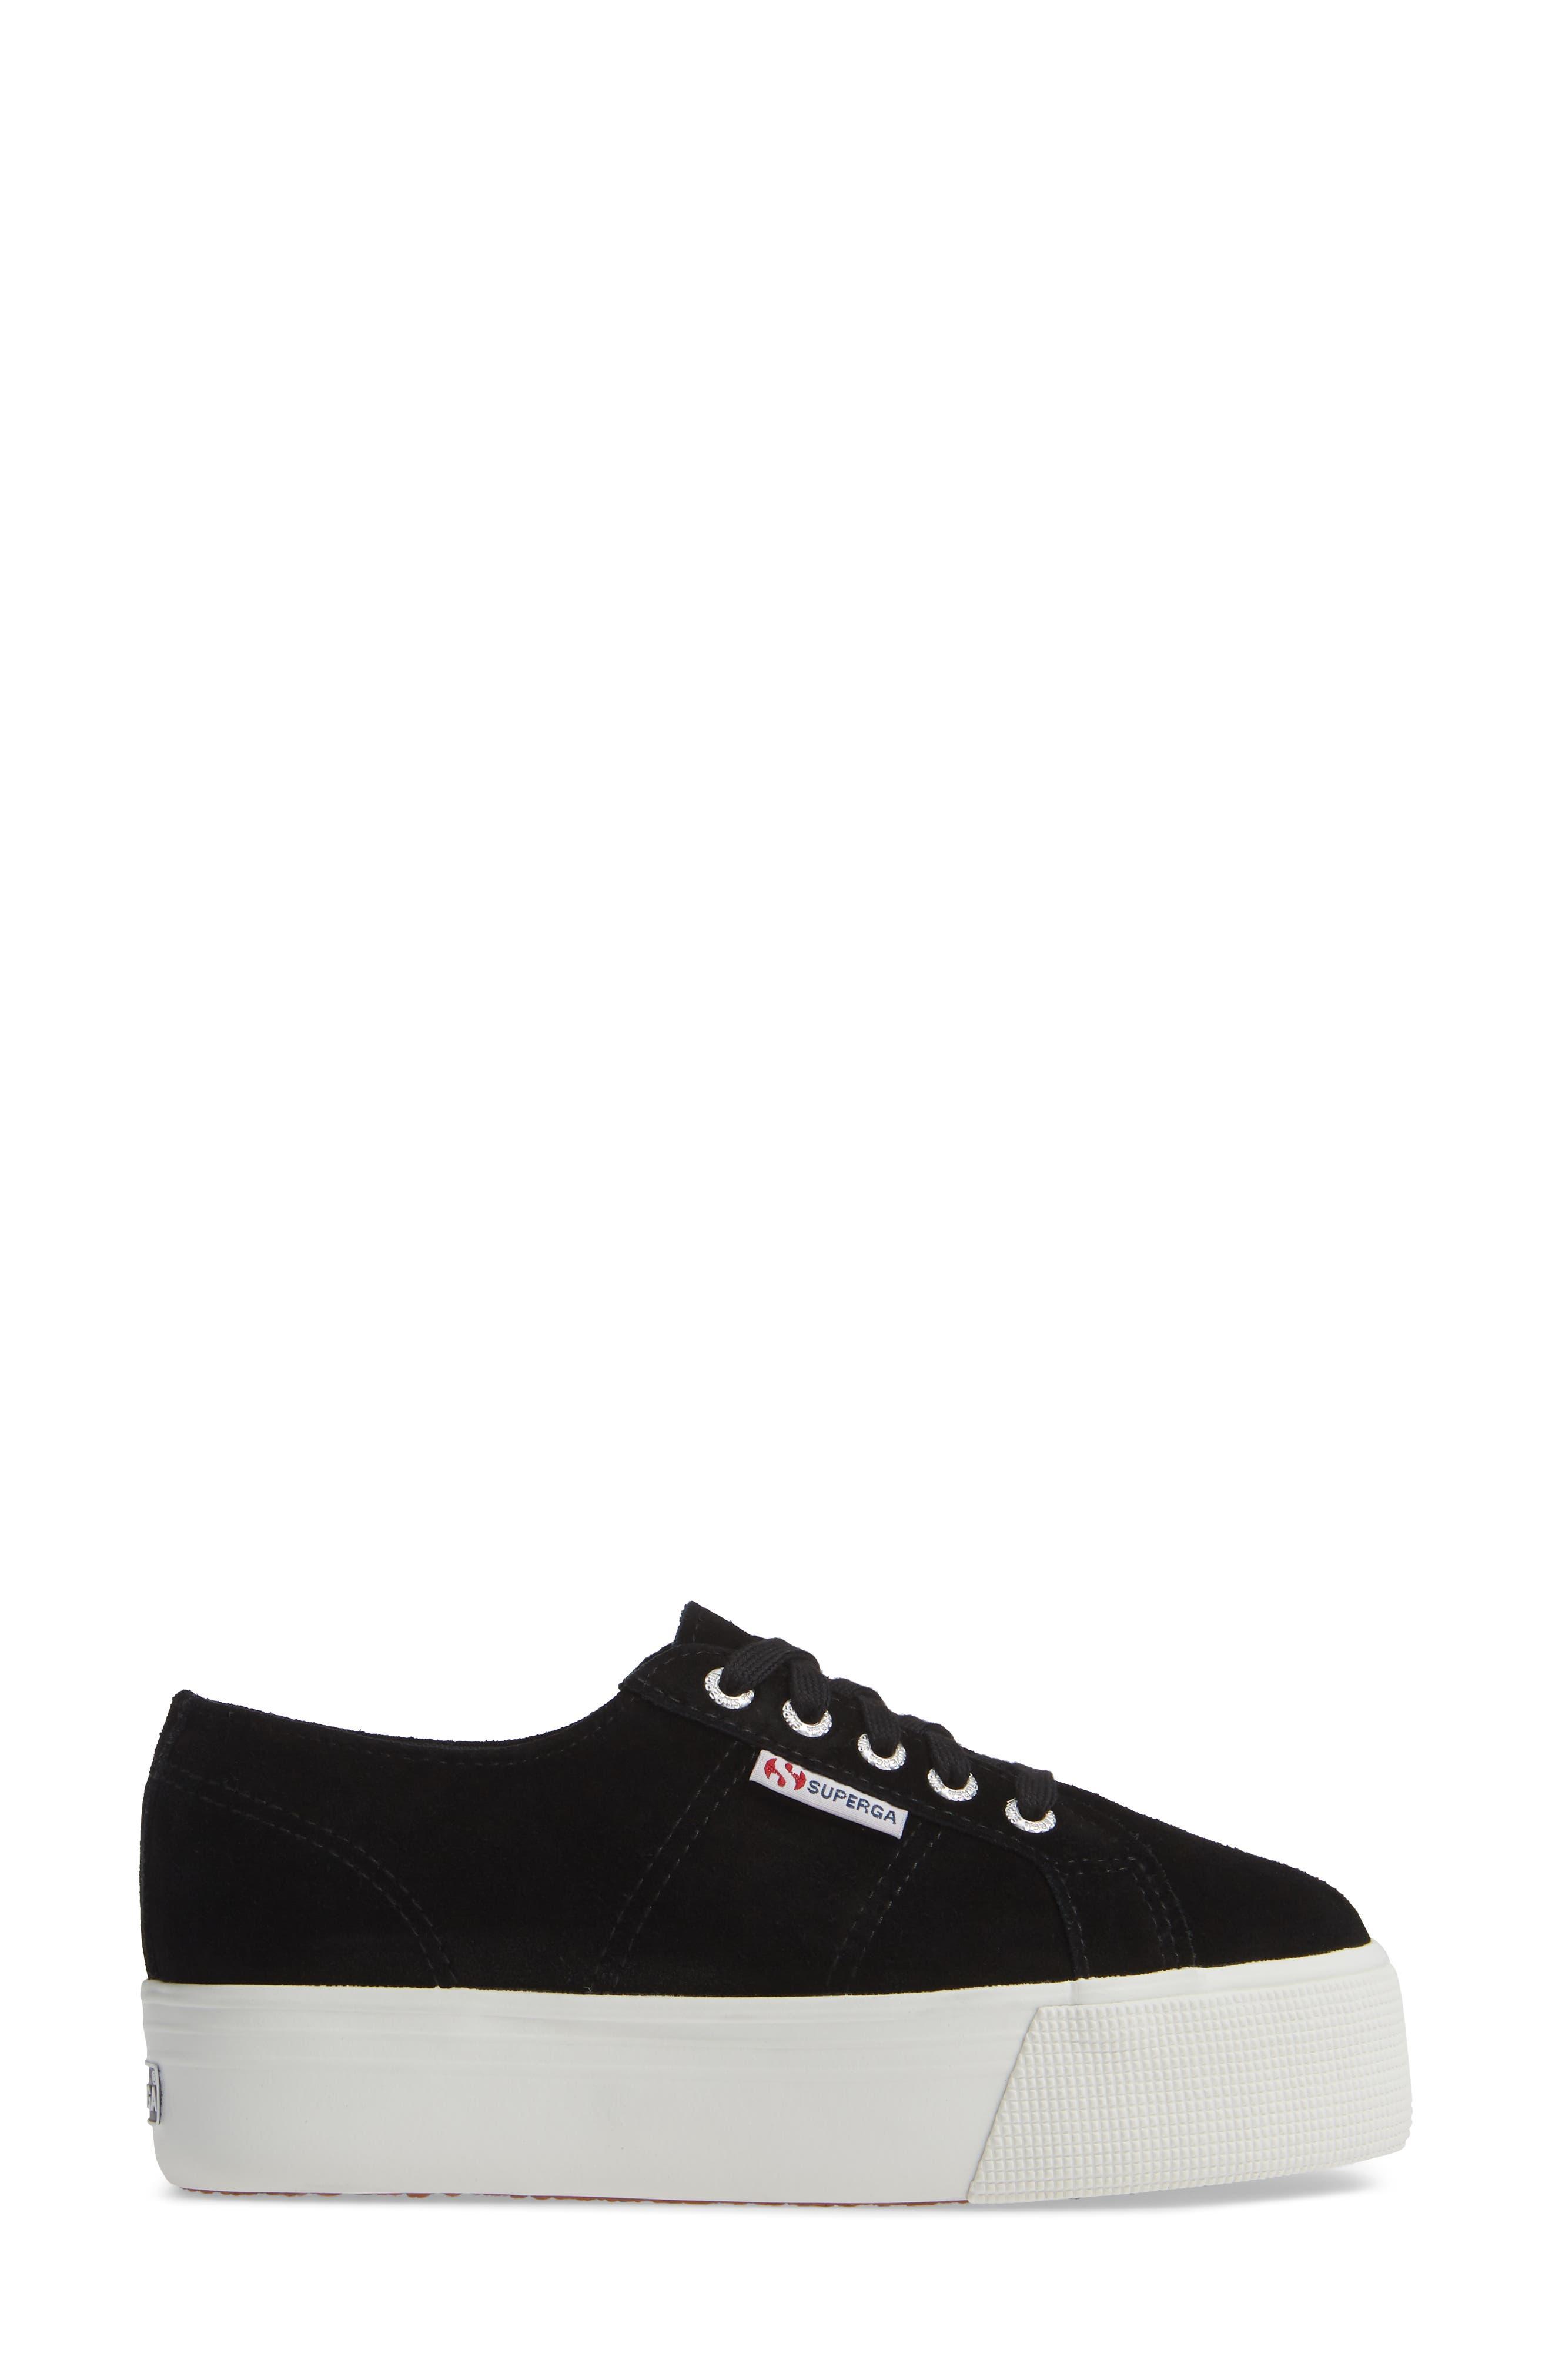 2790 Platform Sneaker,                             Alternate thumbnail 3, color,                             006